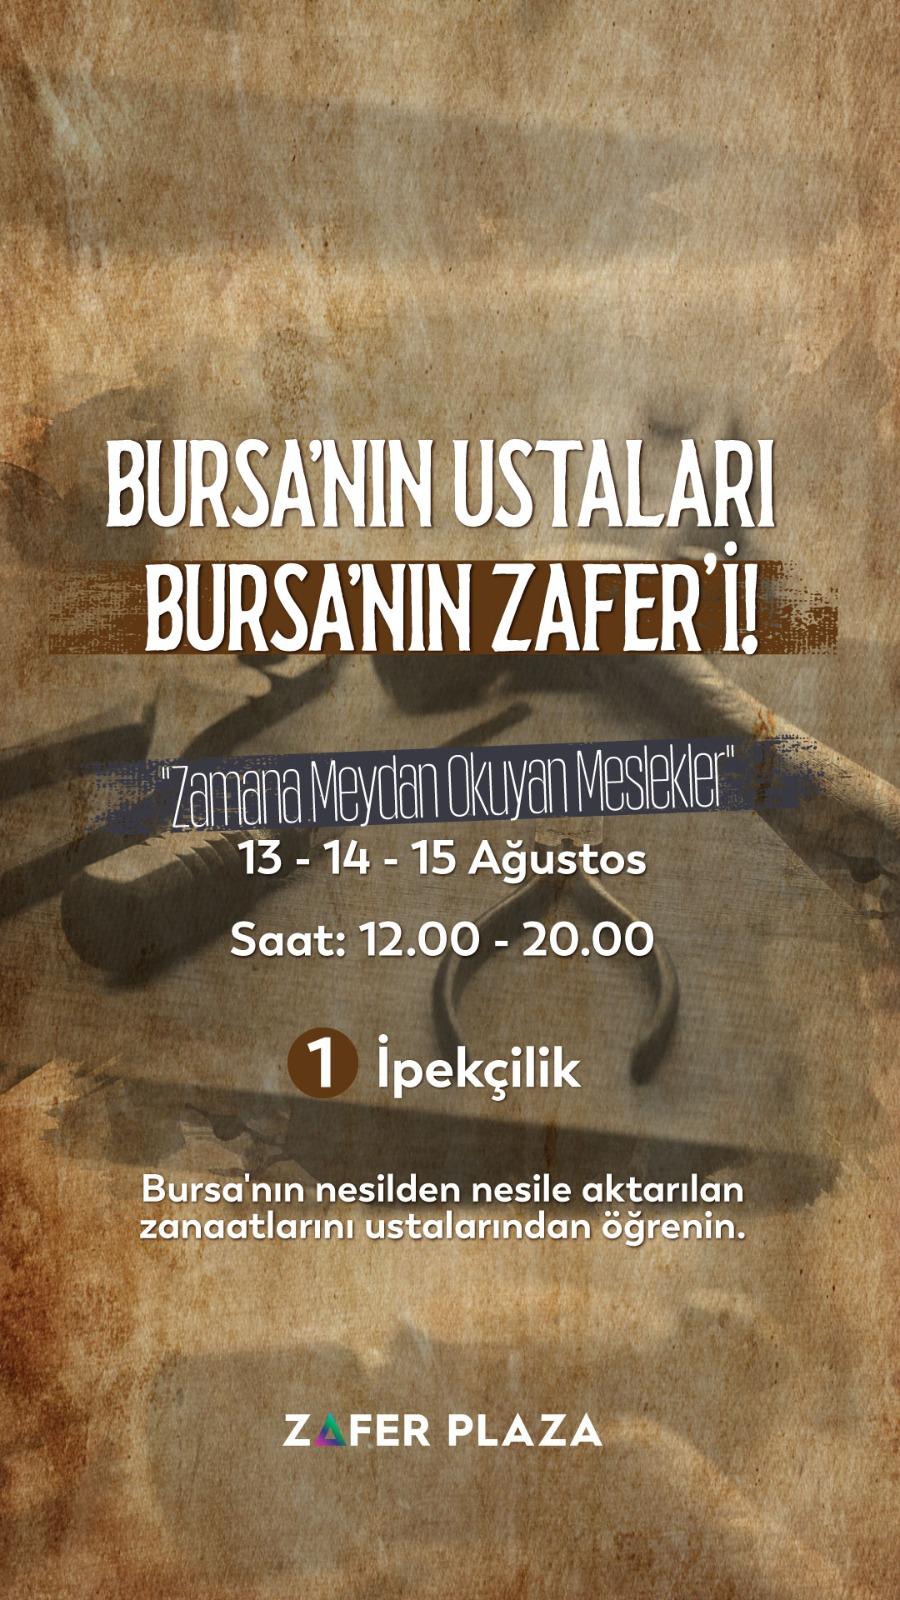 Bursa'nın Ustaları